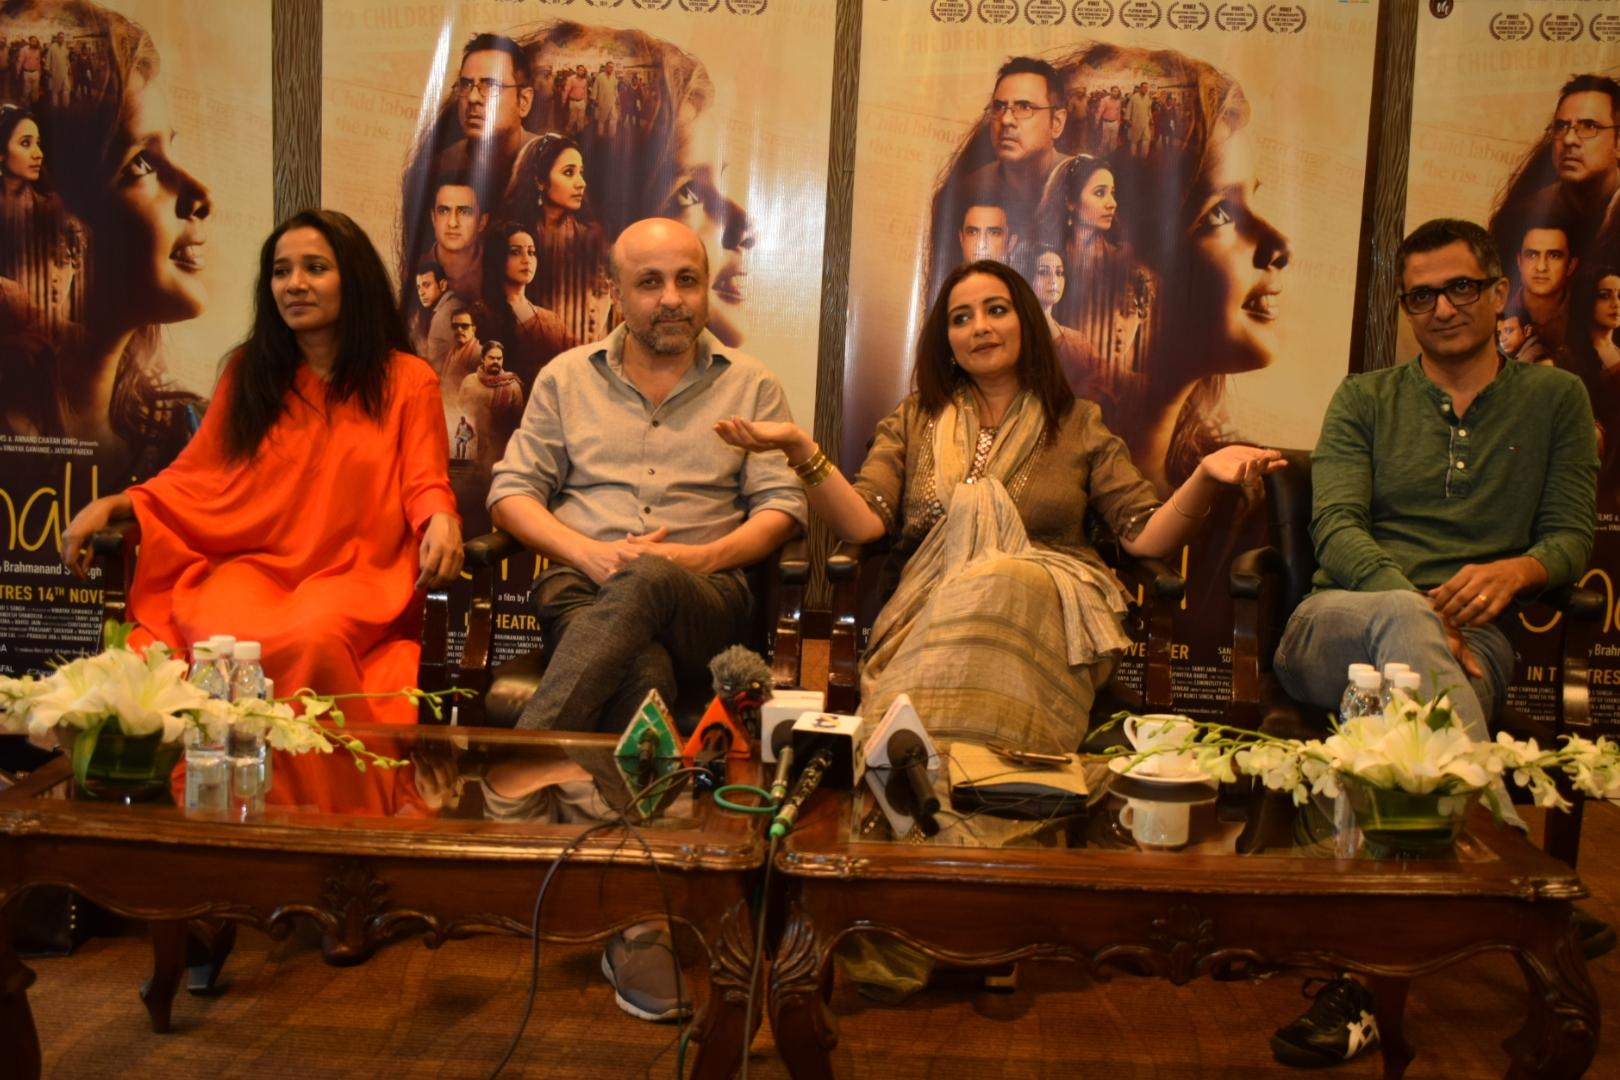 Sanjay Suri Says Hope 'Jhalki' Starts a Discussion on Child Labour